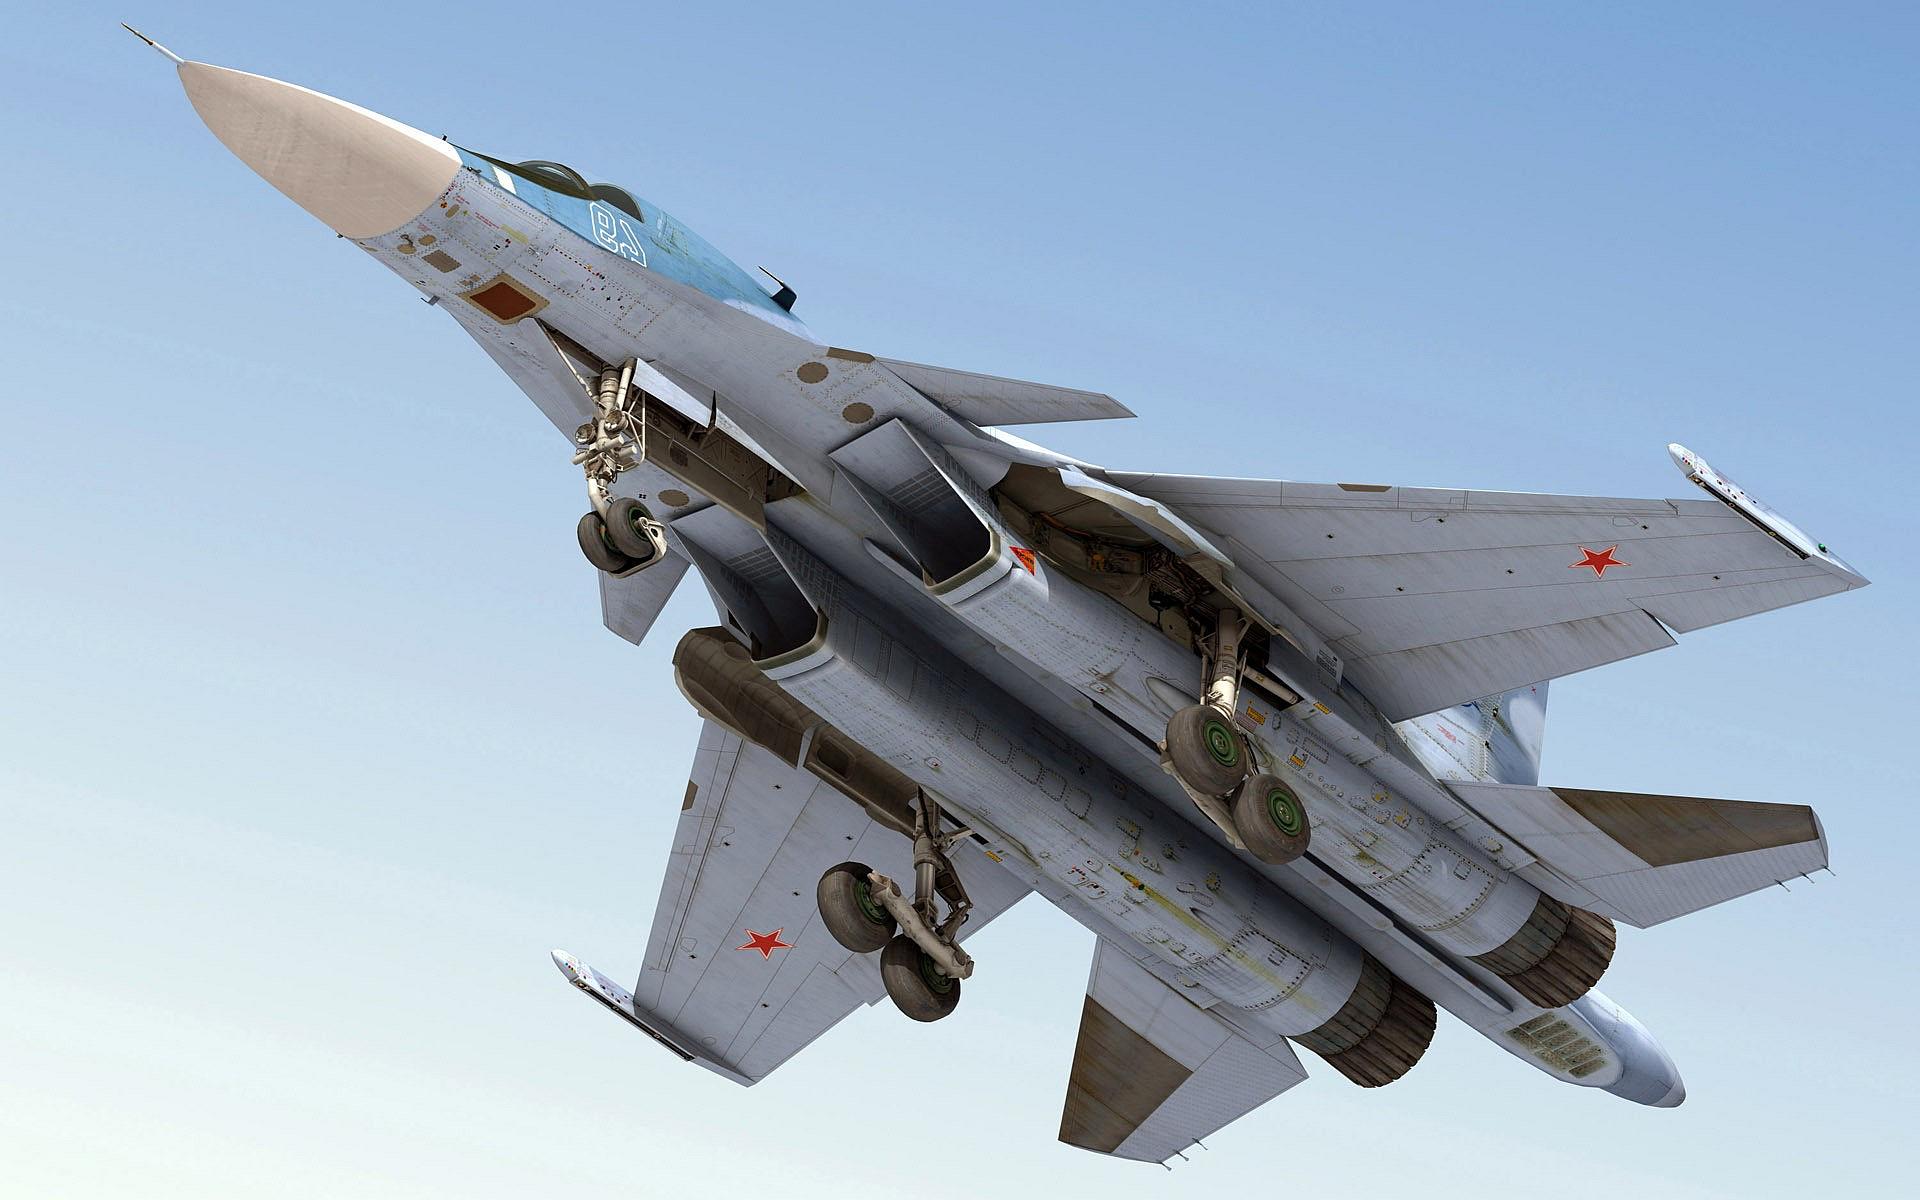 SU 34 Jet Fighter